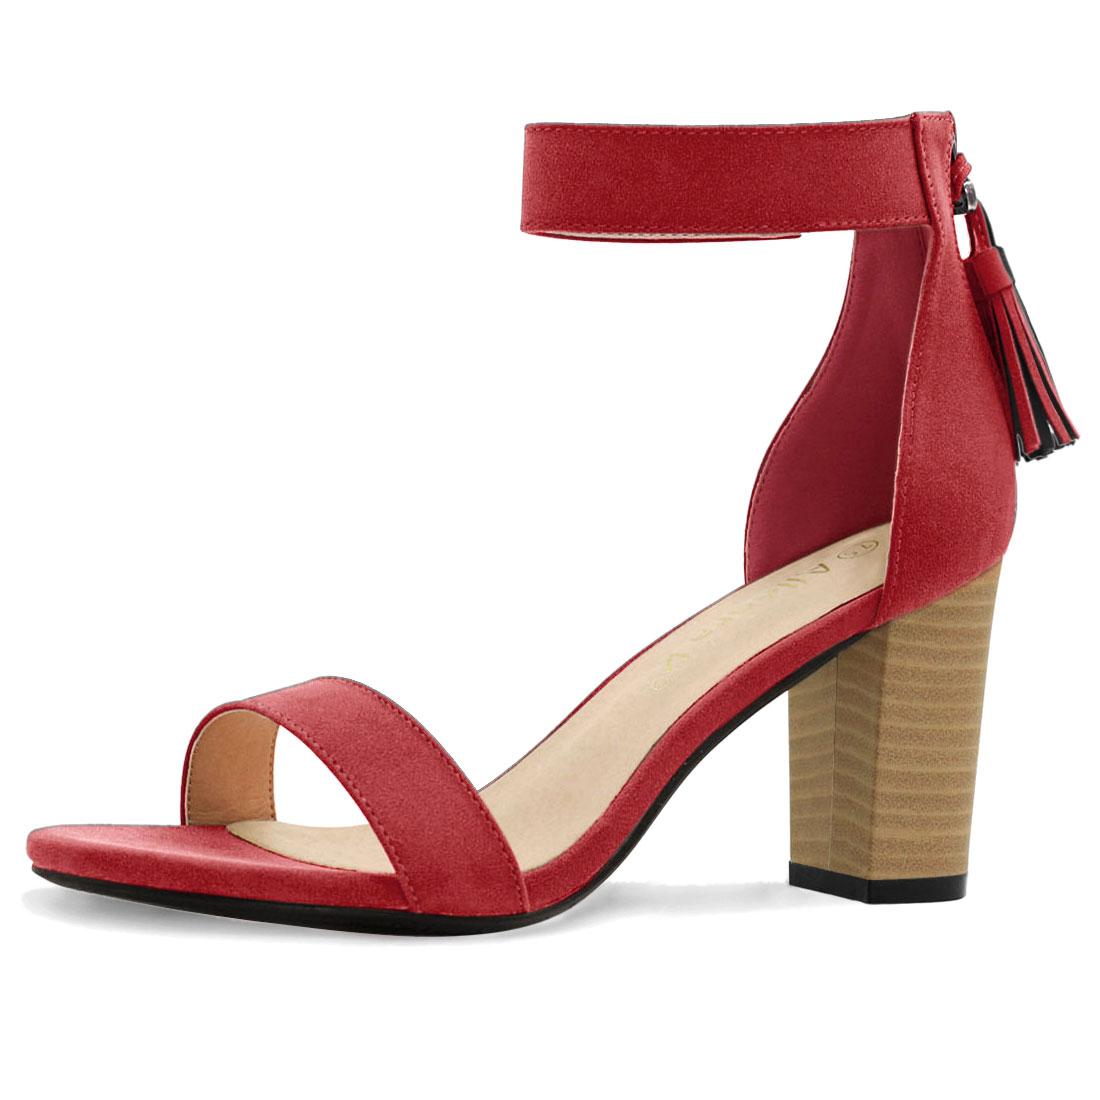 Women Open Toe Tassel Stacked Heel Ankle Strap Sandals Red US 5.5